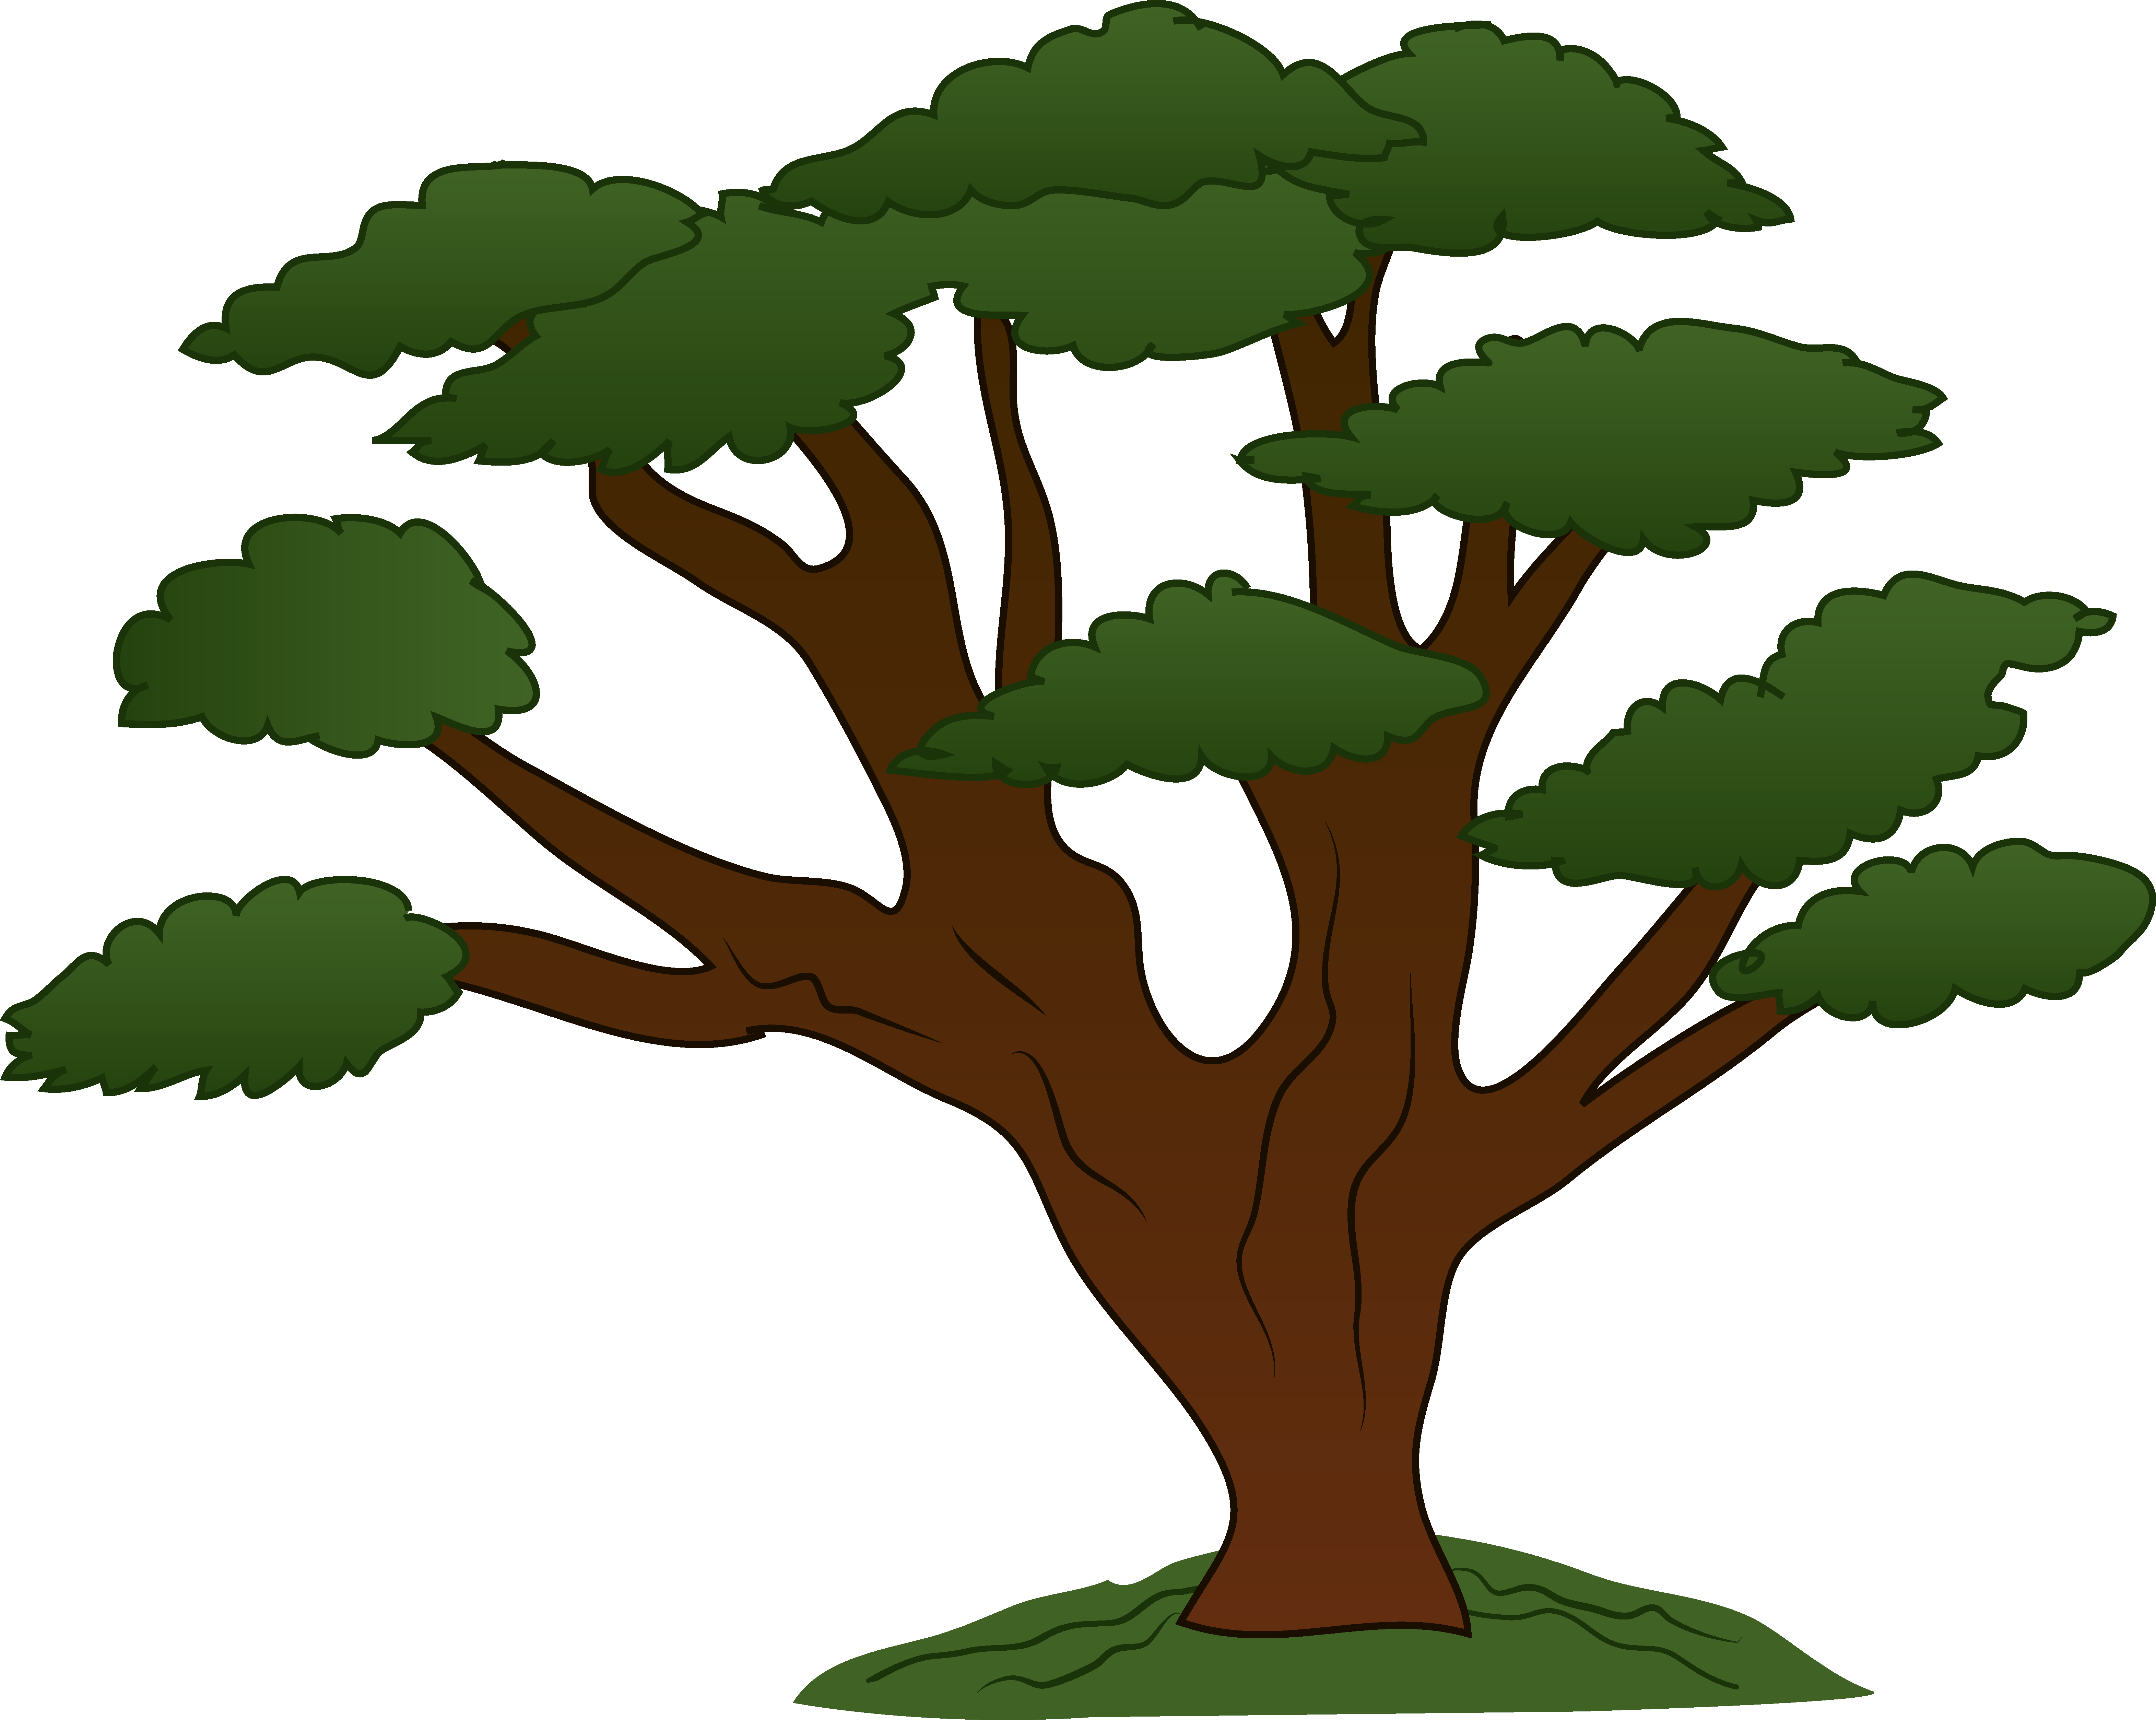 Tree Clip Art - clipartall-Tree Clip Art - clipartall-7